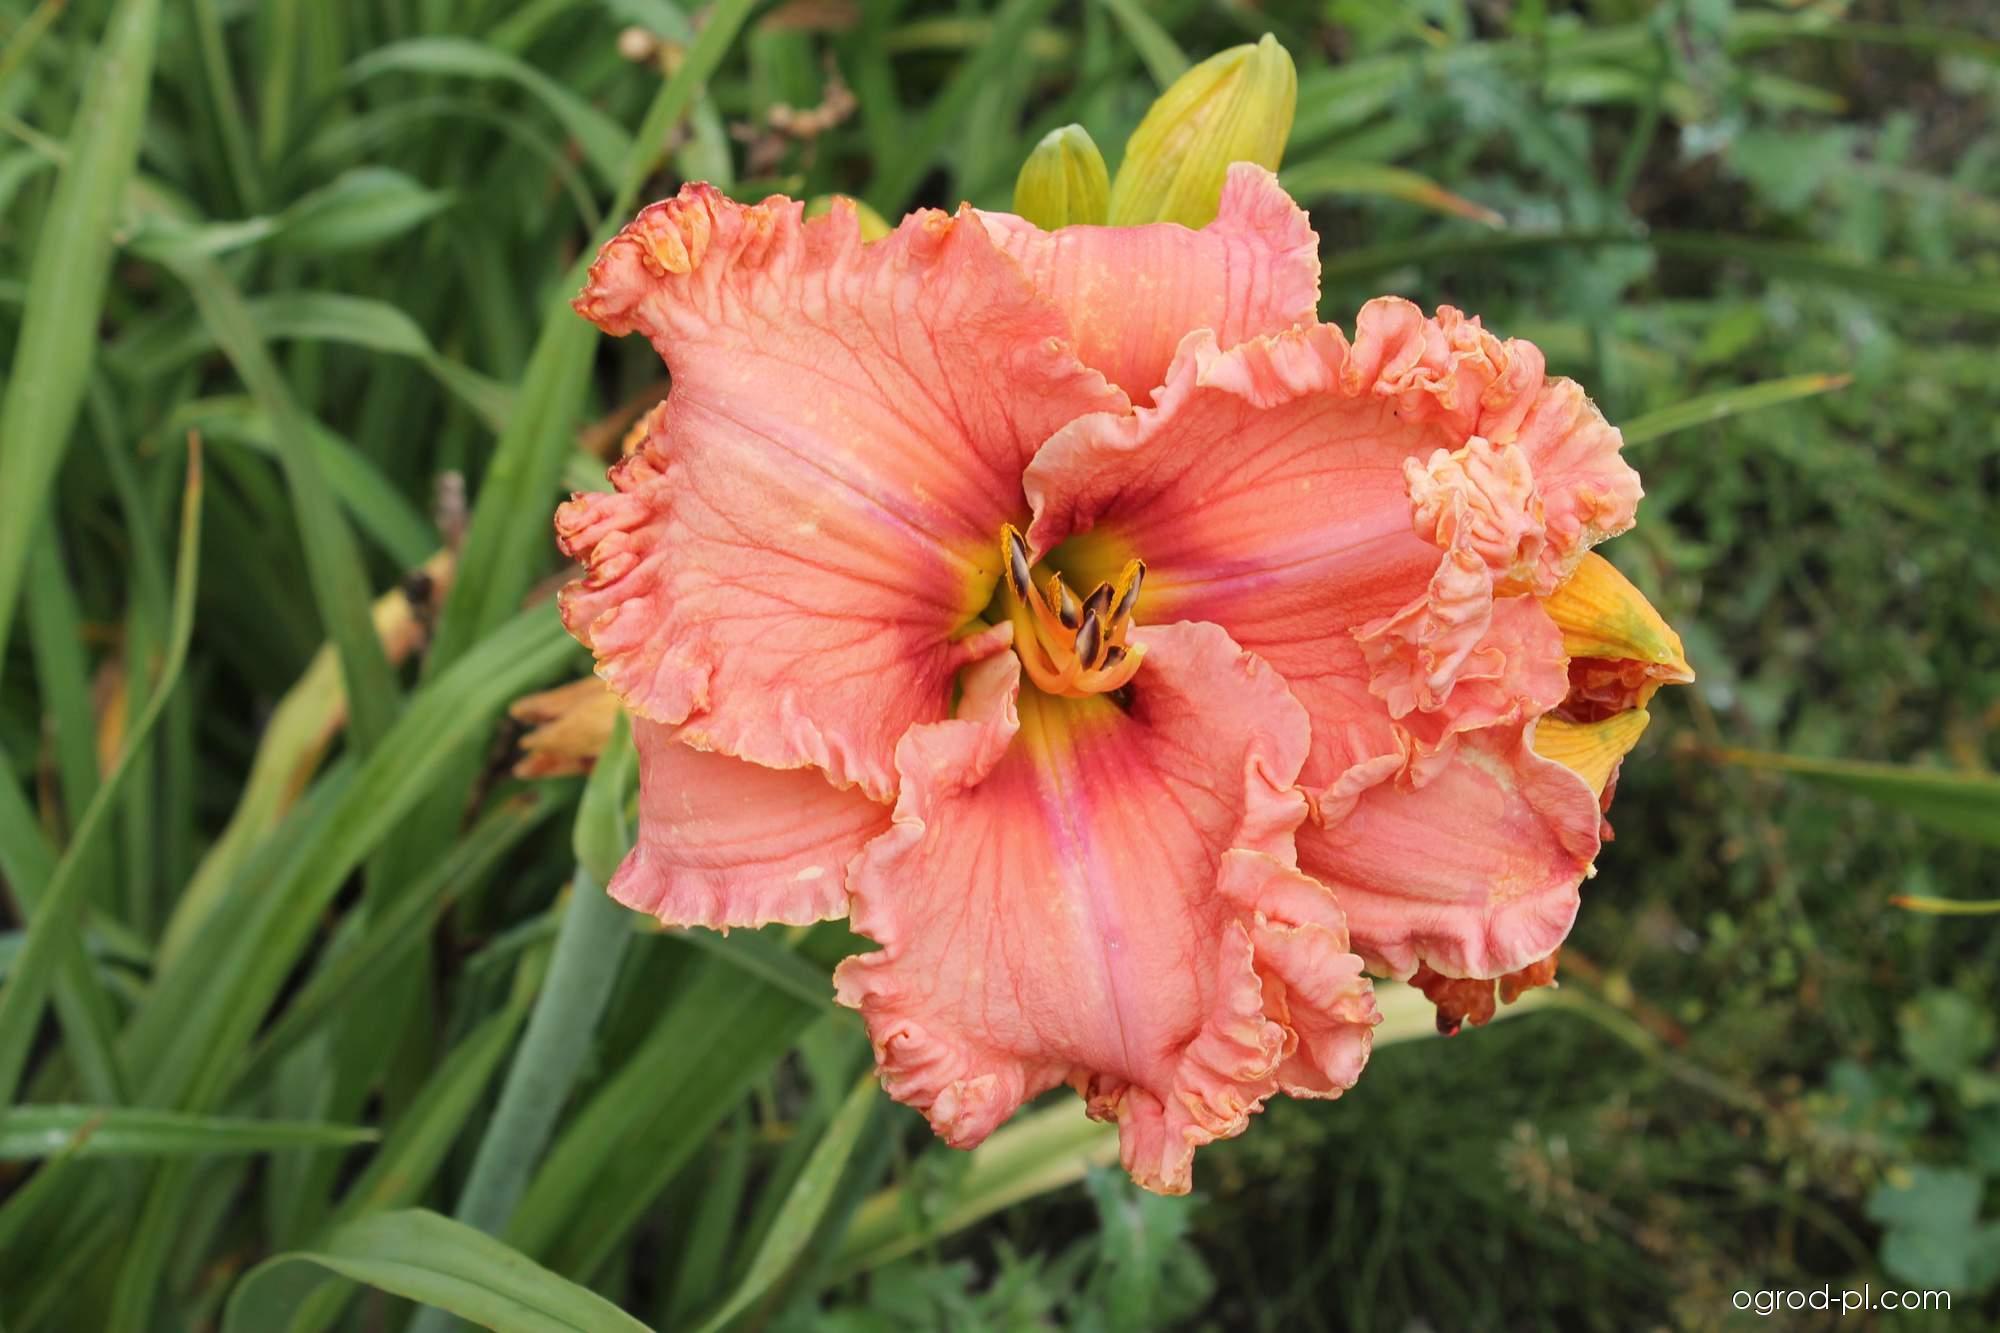 Liliowiec ogrodowy - Hemerocallis Reines Delight